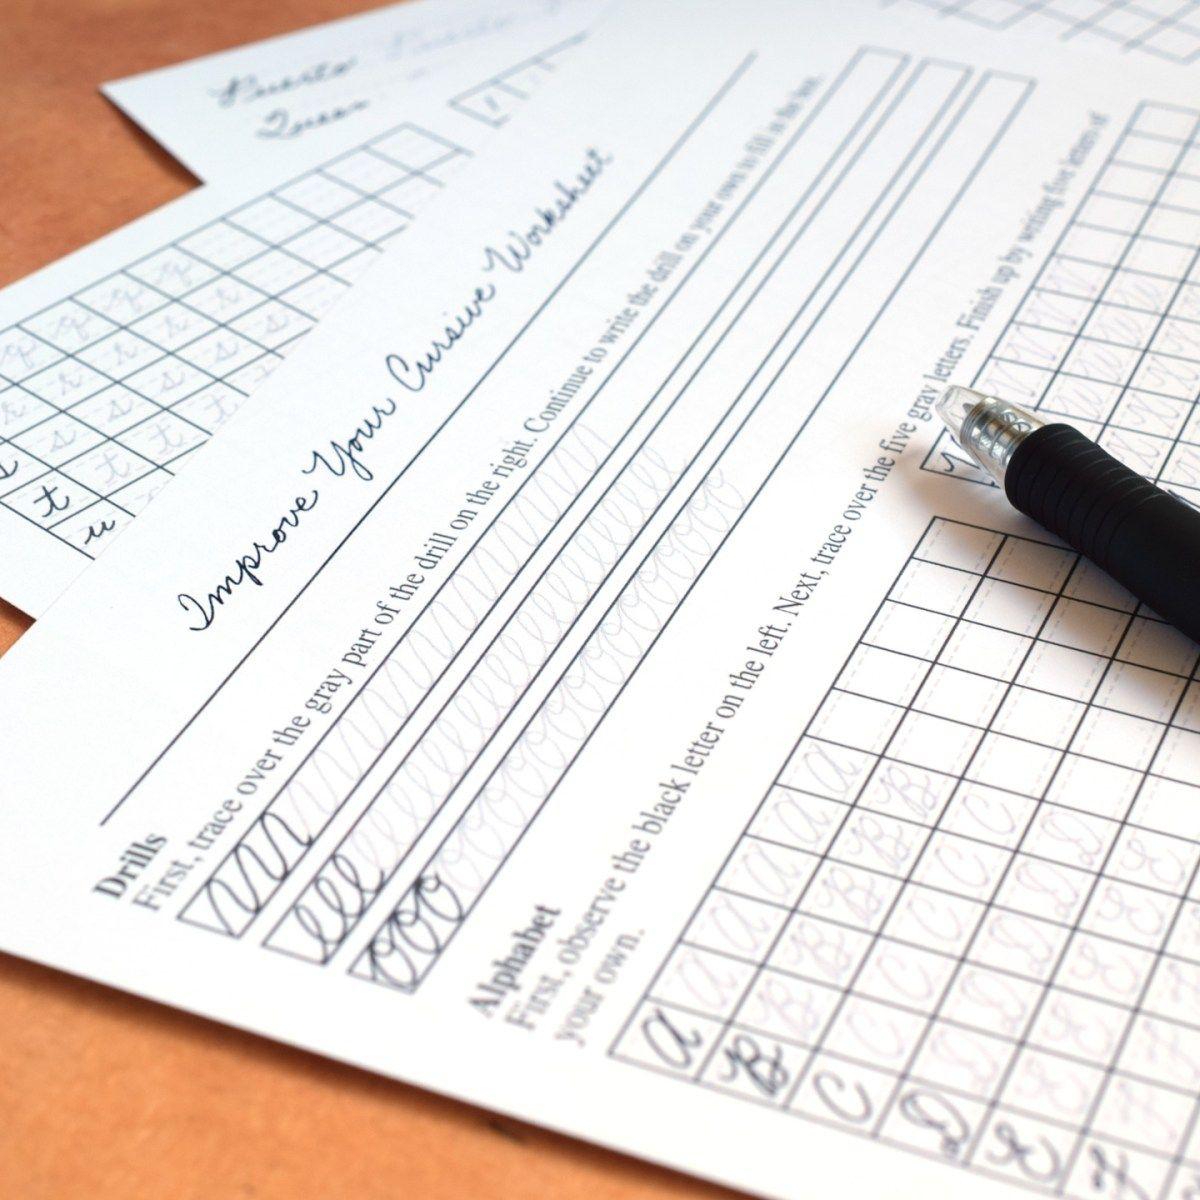 Improve Your Cursive Worksheet Set The Postman S Knock Cursive Worksheets Improve Your Handwriting Learn Handwriting